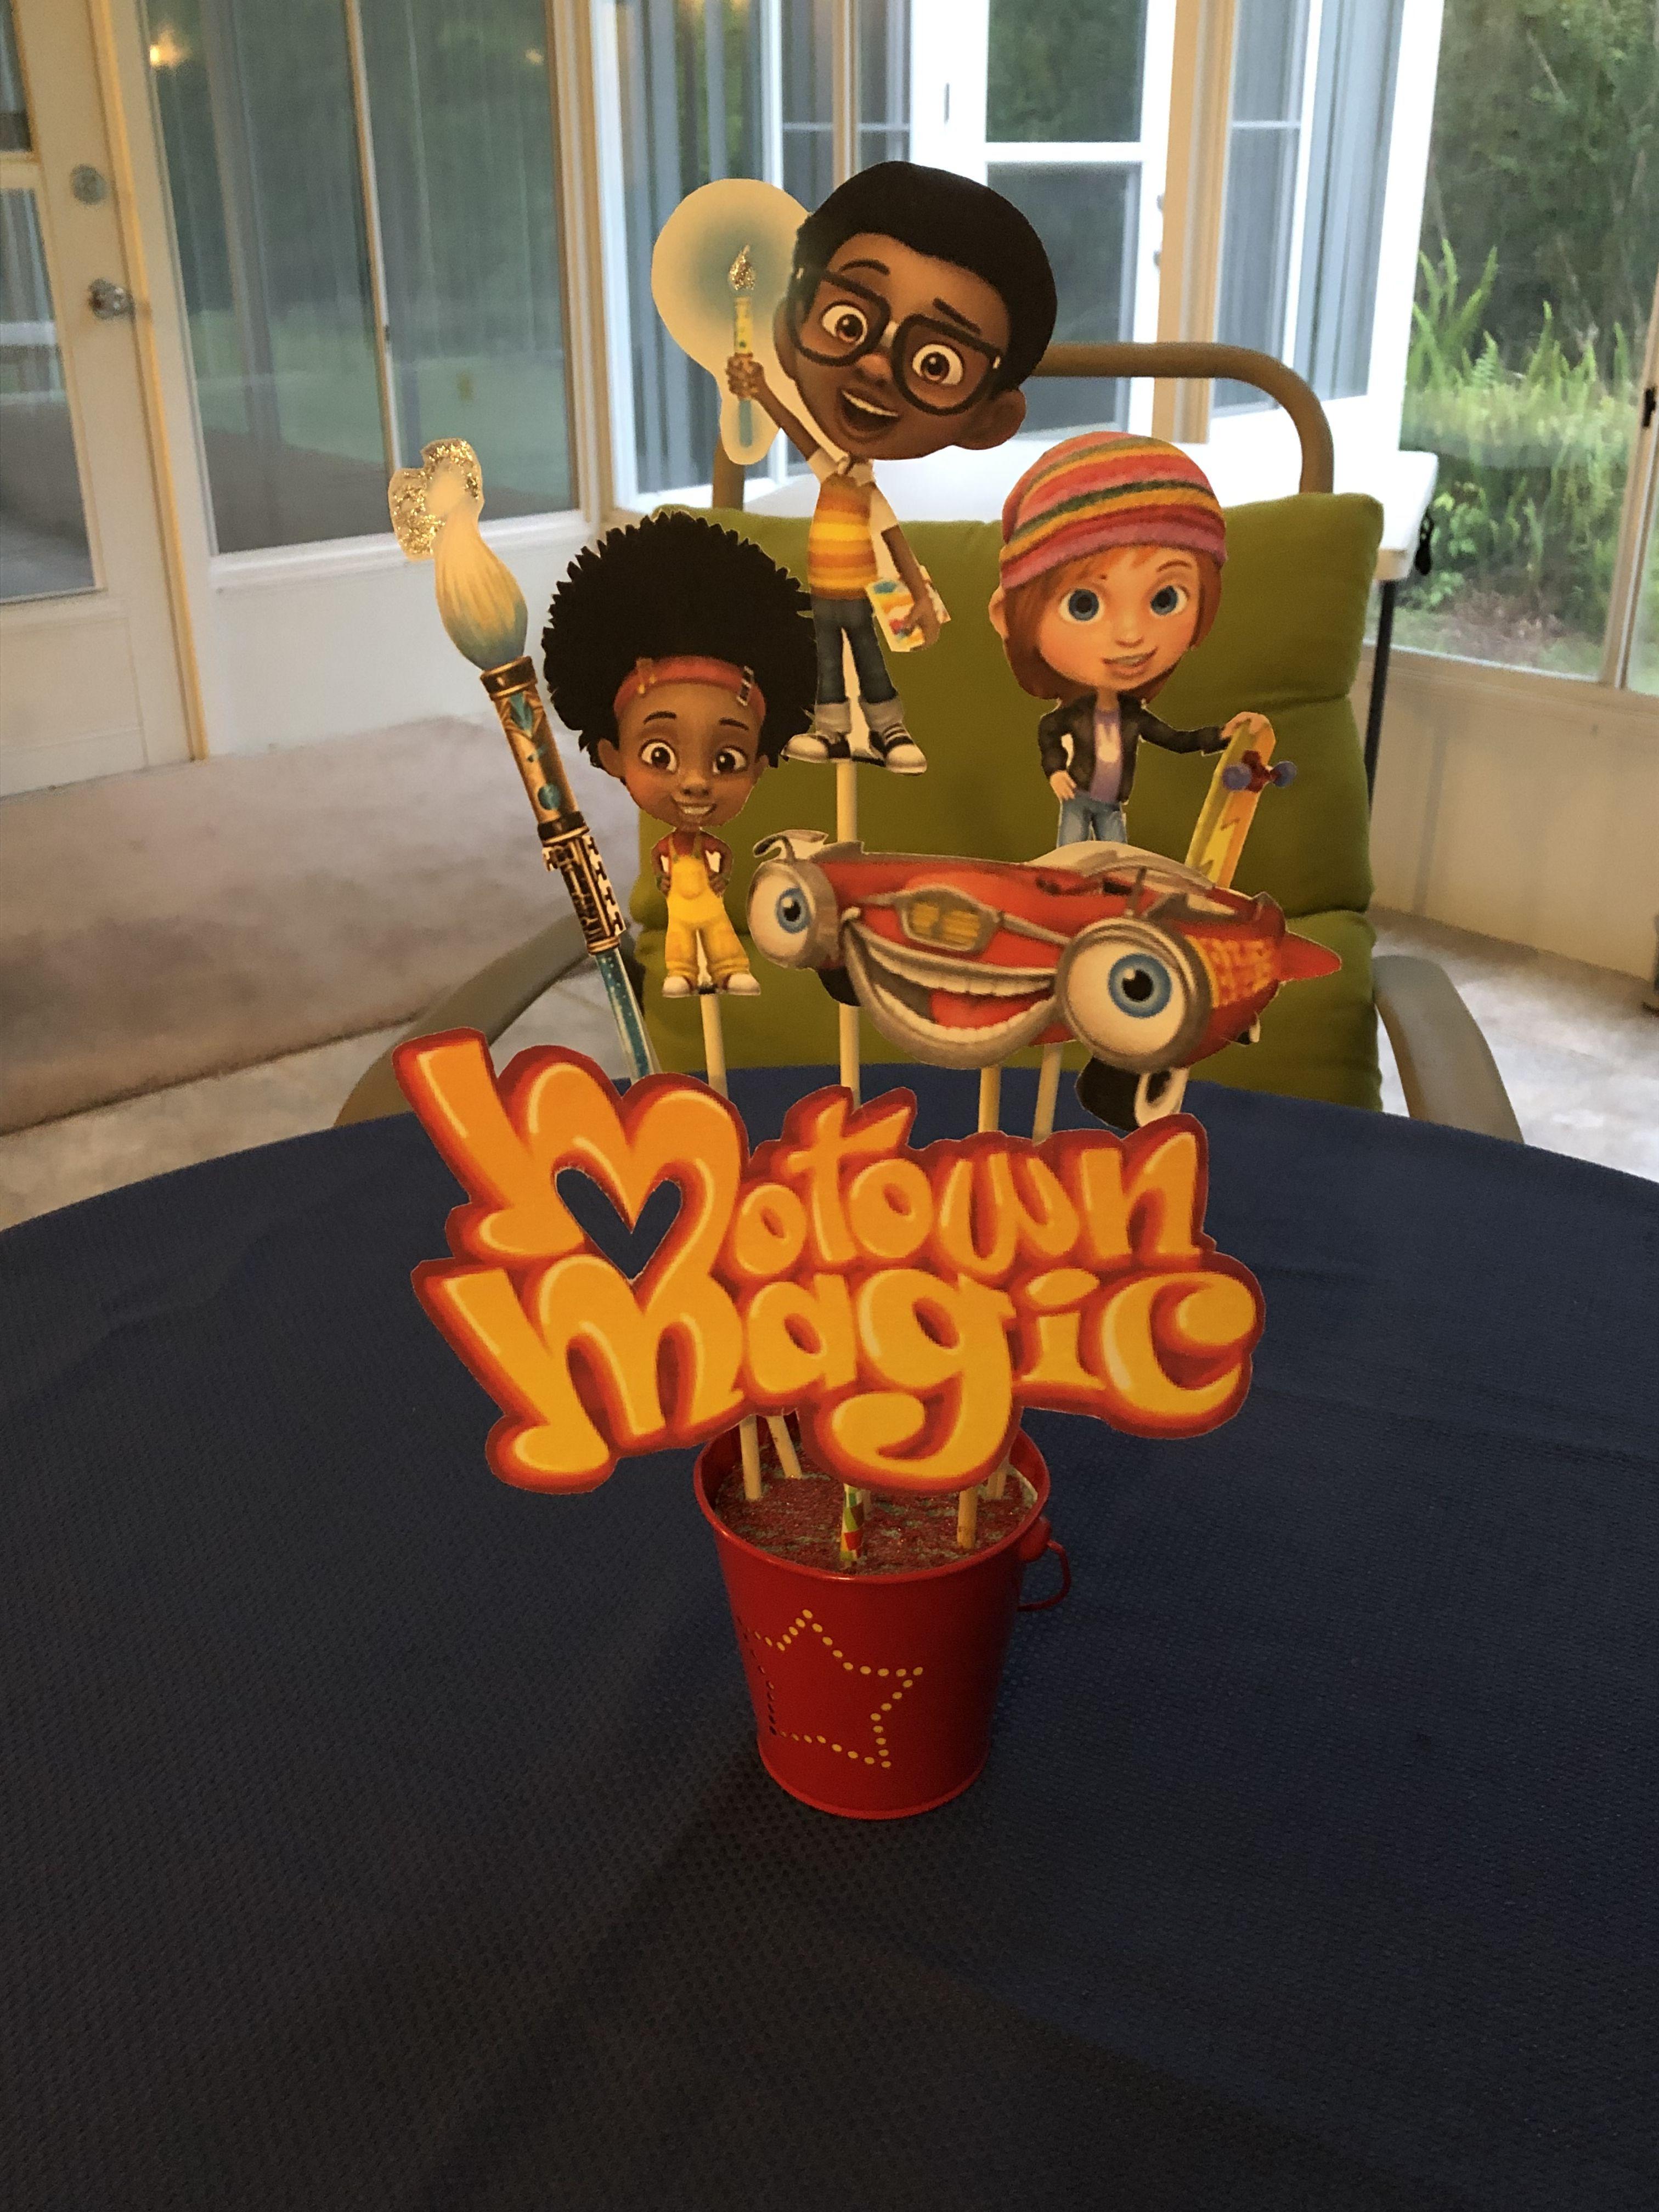 Motown Magic birthday decor